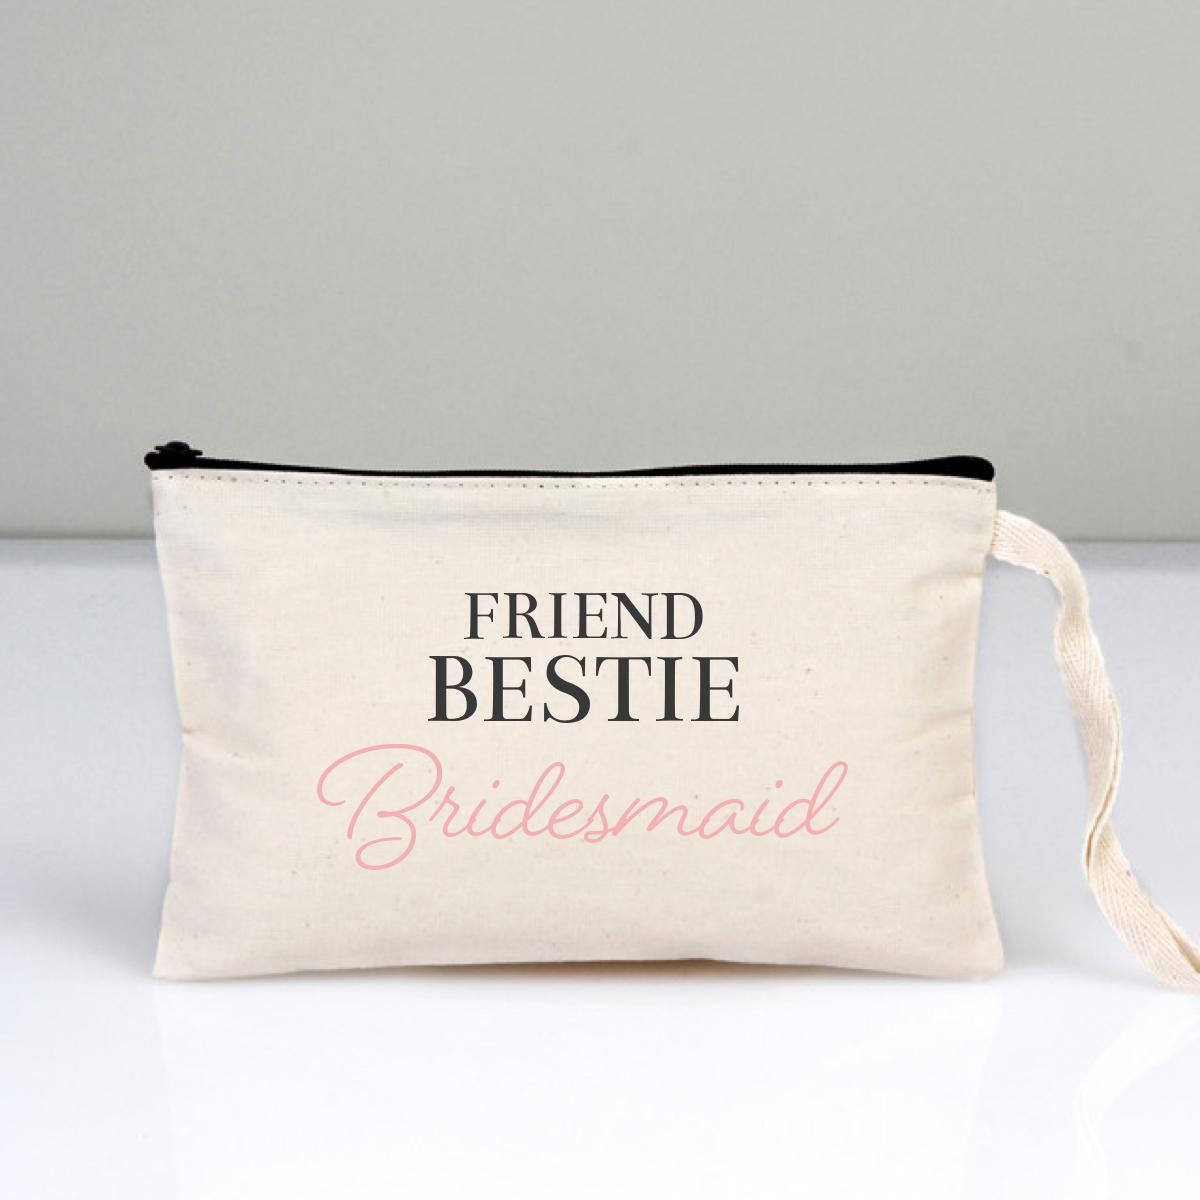 Friend Bestie Bridesmaid Makyaj Çantası Clutch